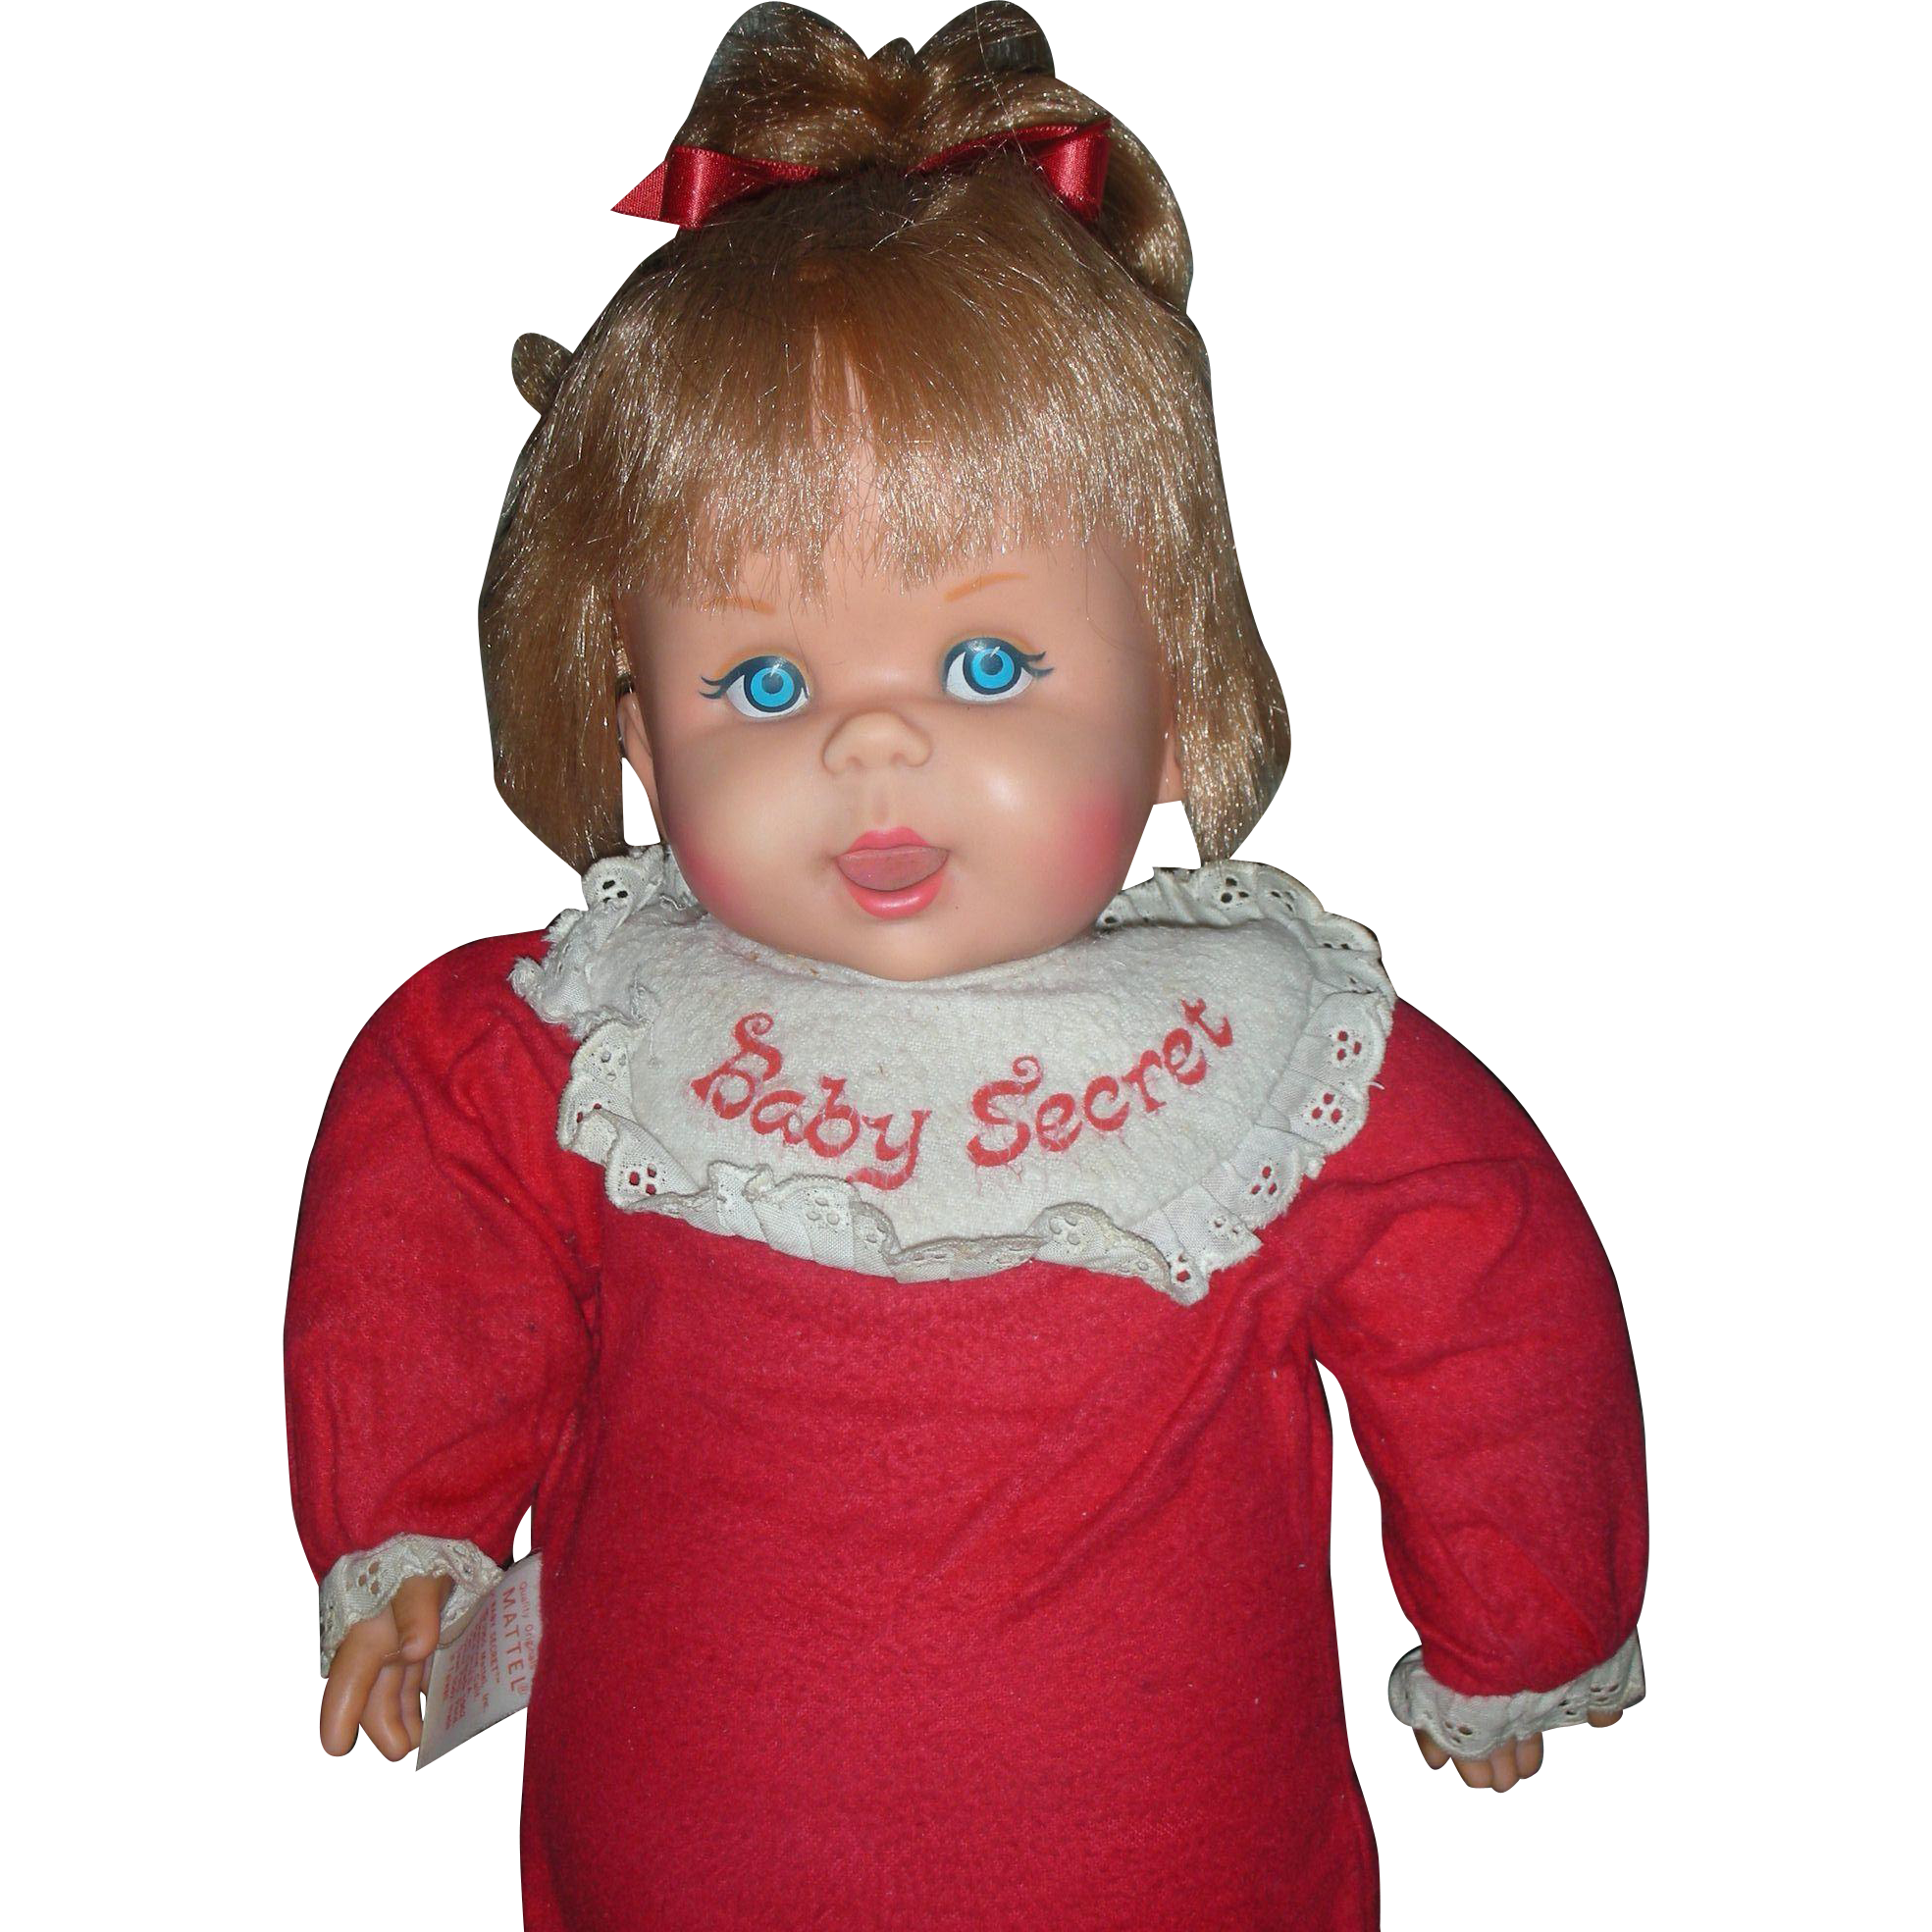 Vintage Mattel 1965 Talking Baby Secrets Doll Still Works